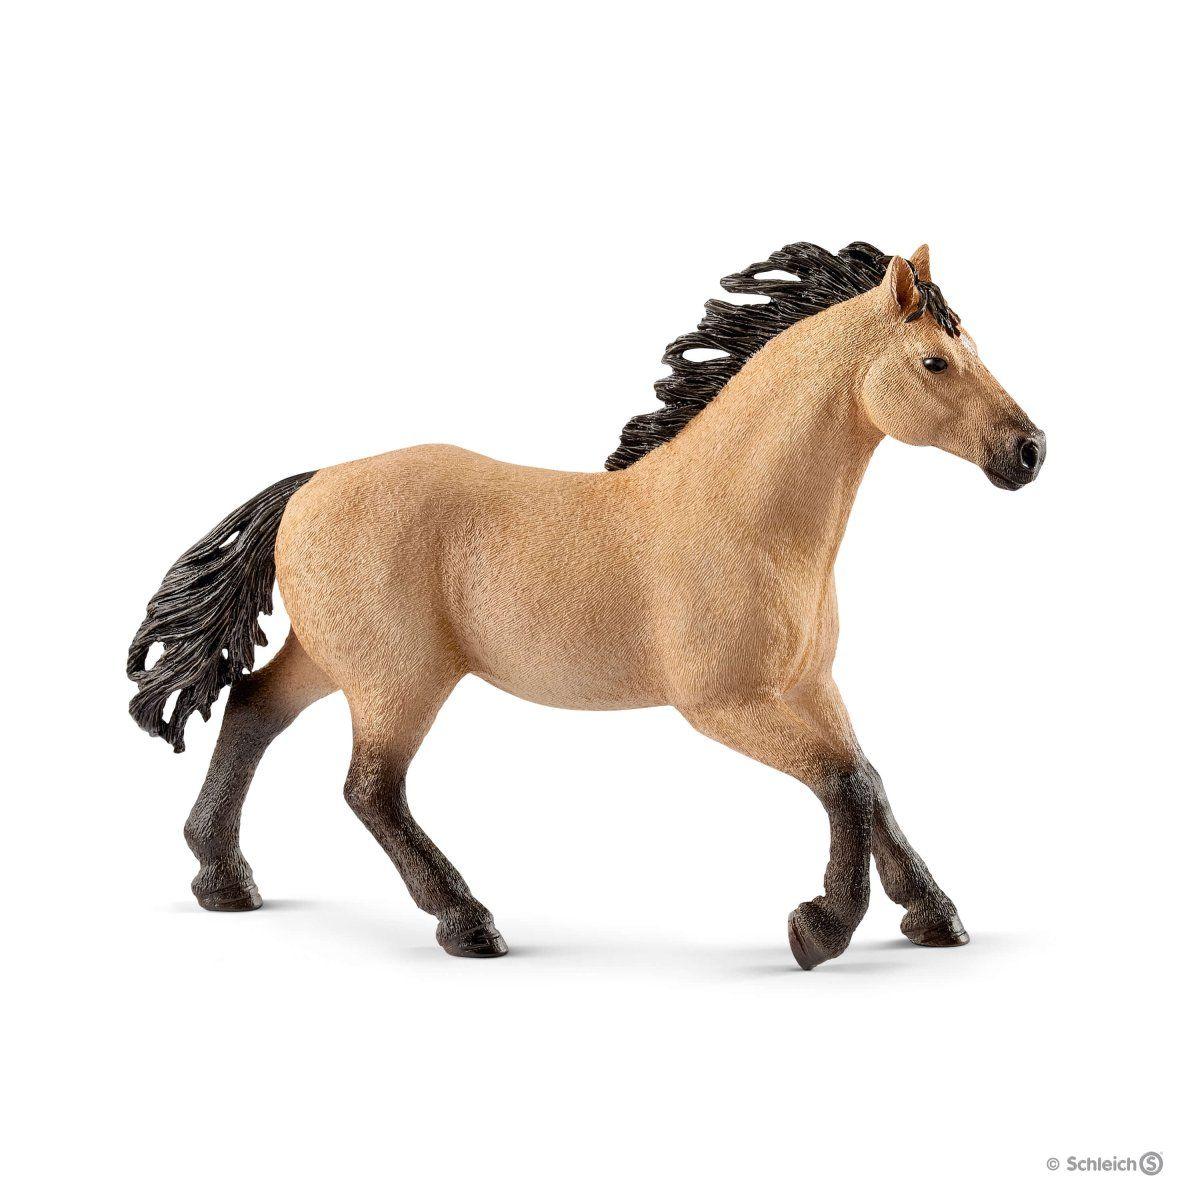 10,4cm 13811 Schleich Horse Club Etalon Arabe Ecurie Figurine Animal Cheval